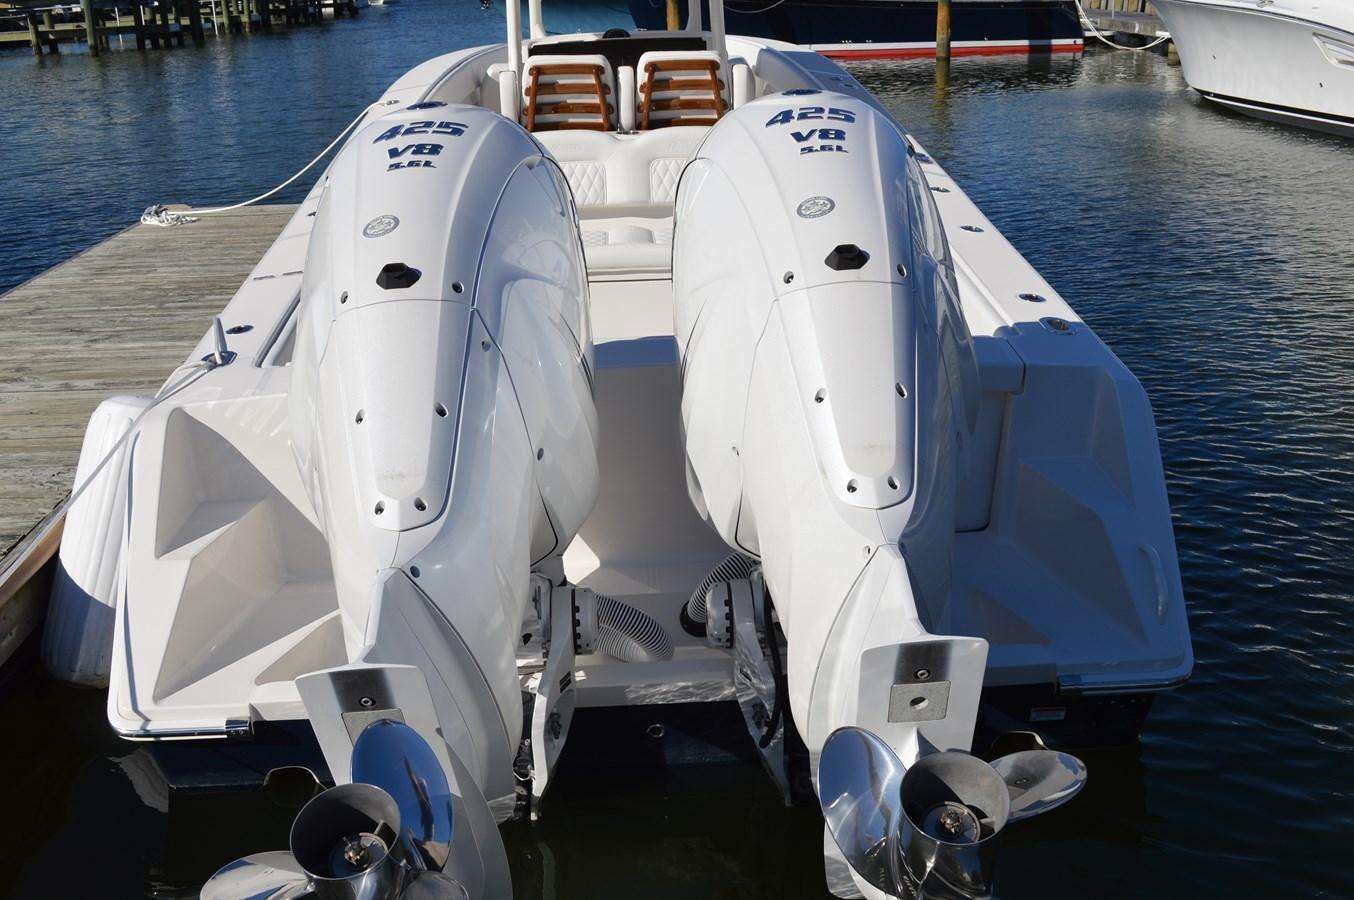 Twin Yamaha 425 Engines - 38 JUPITER For Sale